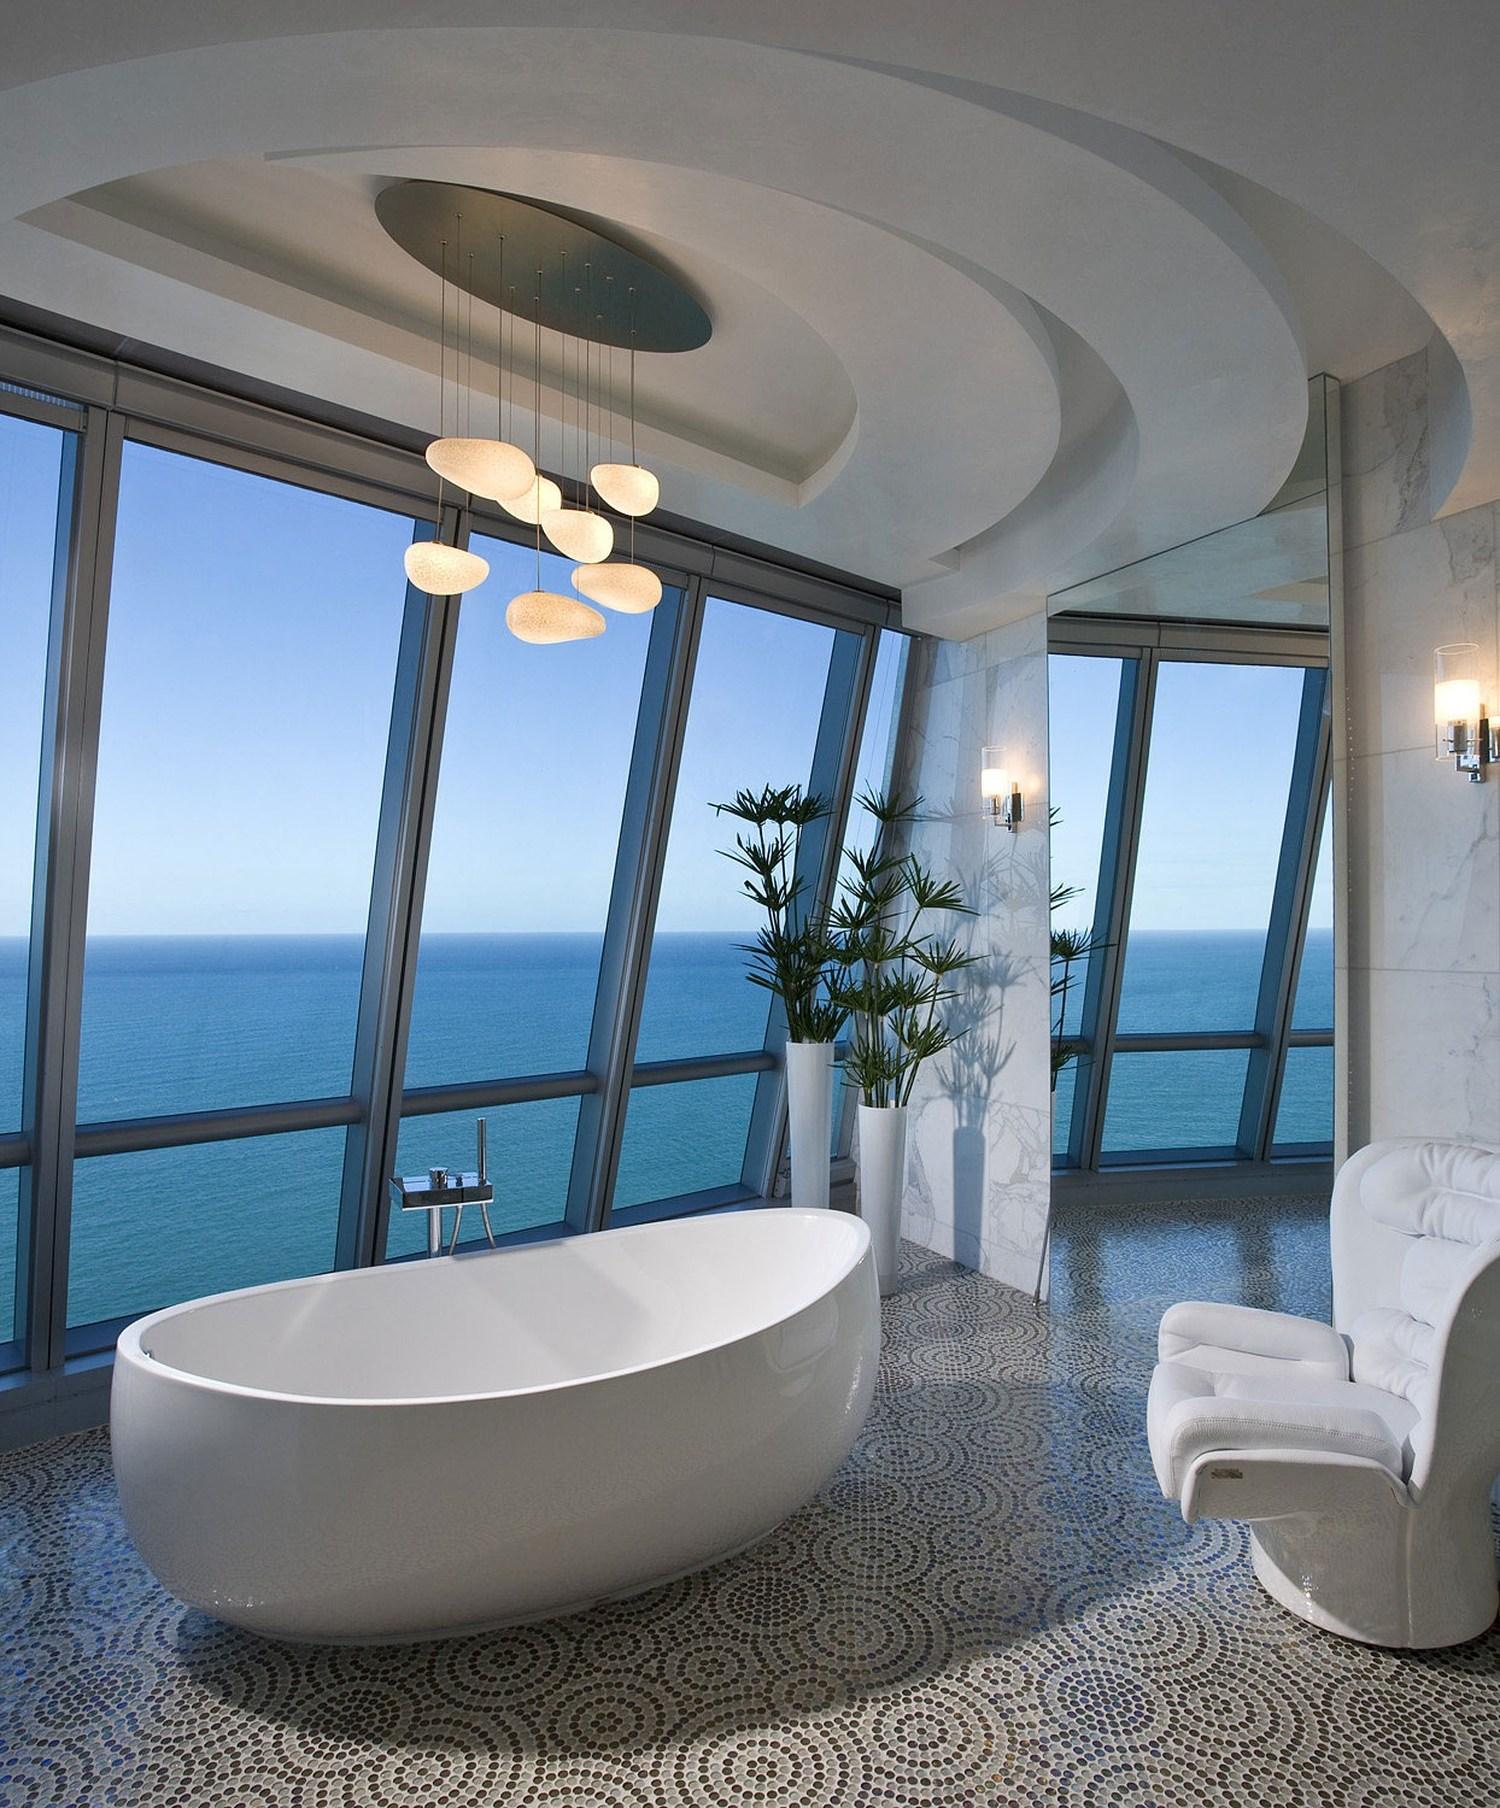 Jade ocean penthouse 2 by pfuner design karmatrendz for Jade ocean penthouse